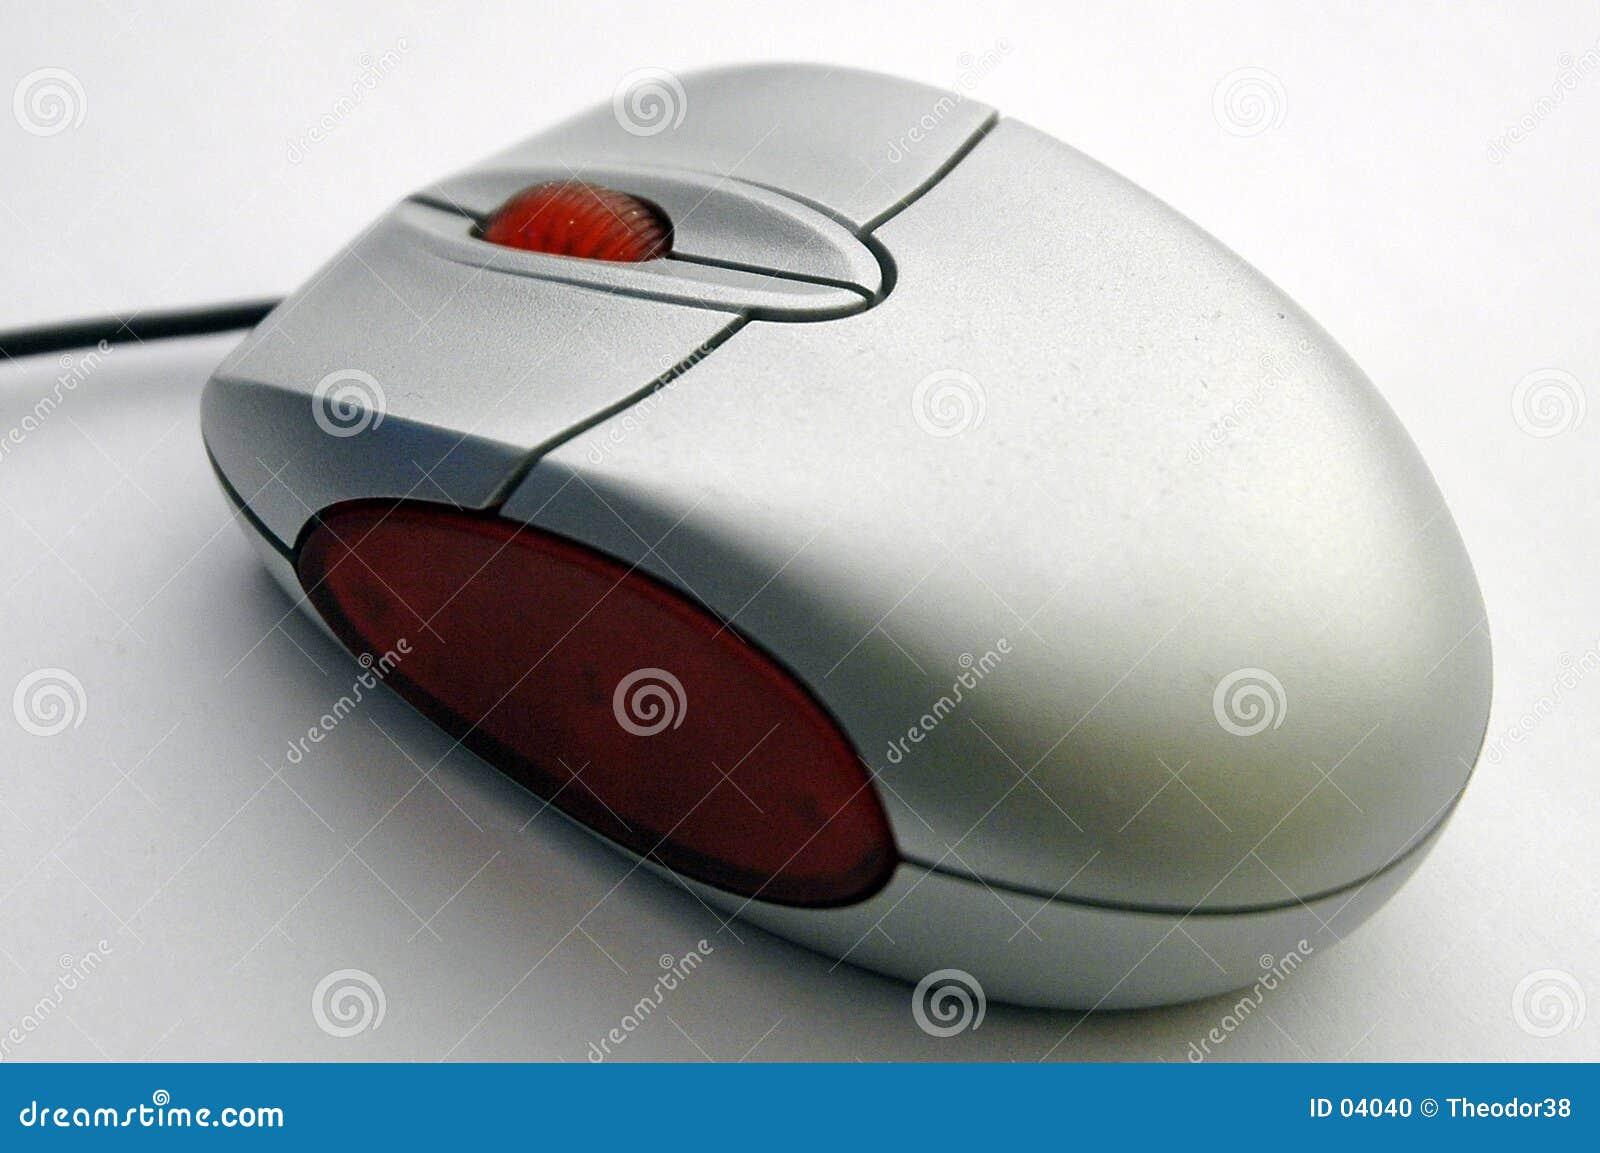 Computer mouse diagonal view